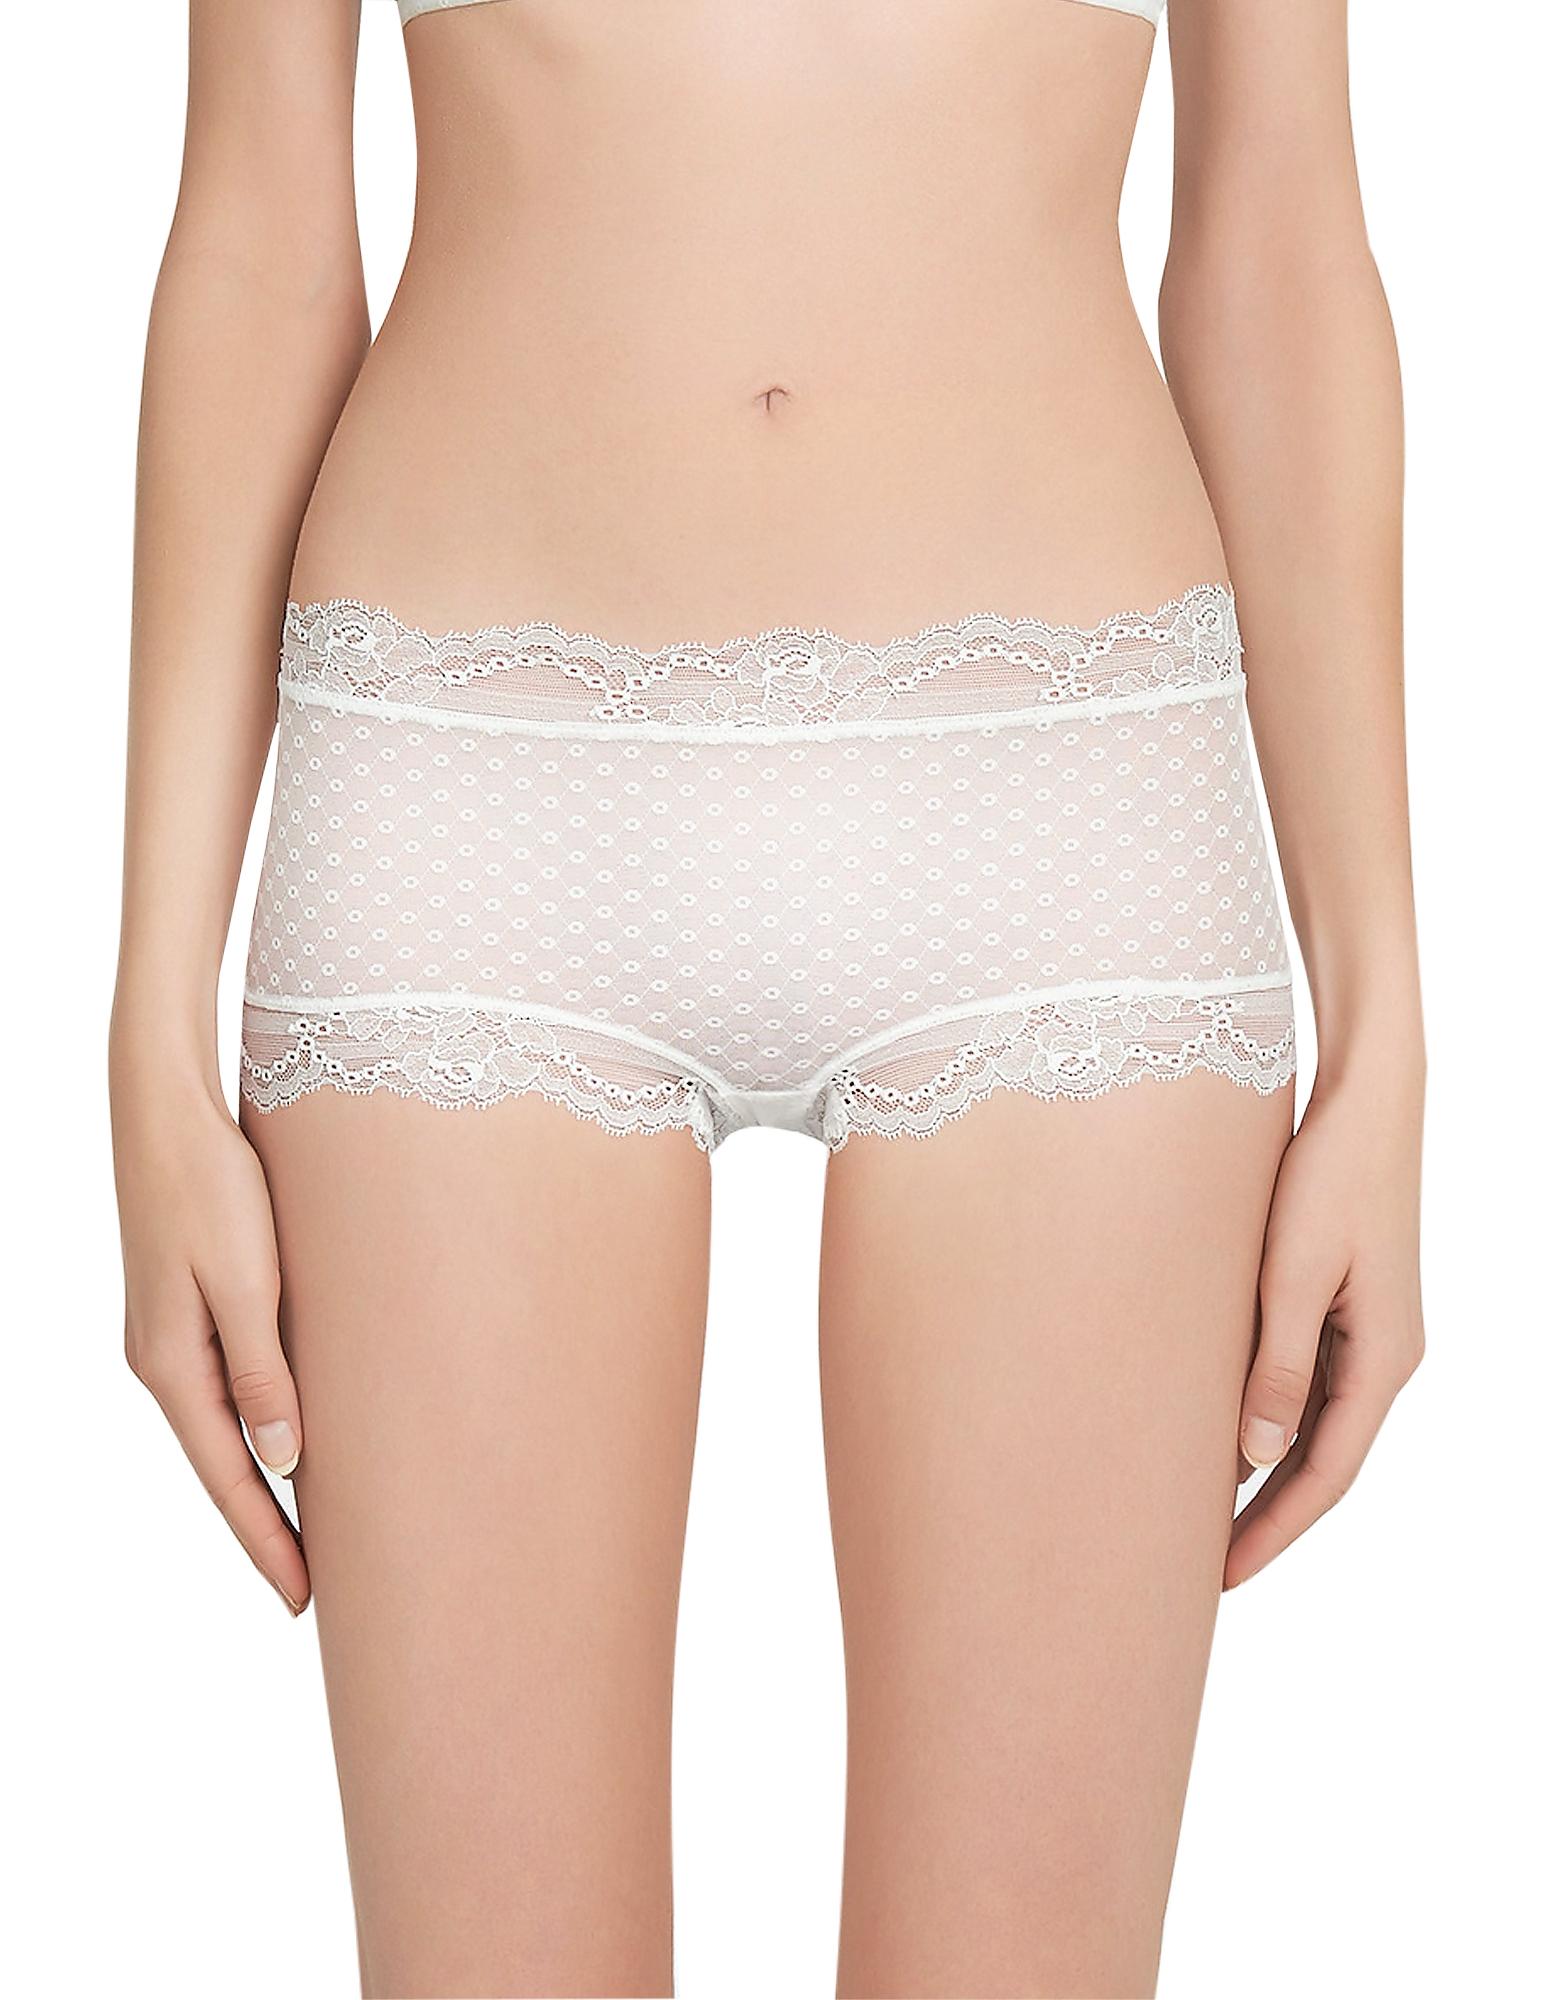 La Perla Panties, Tuberose White Leavers Lace Hipster Briefs